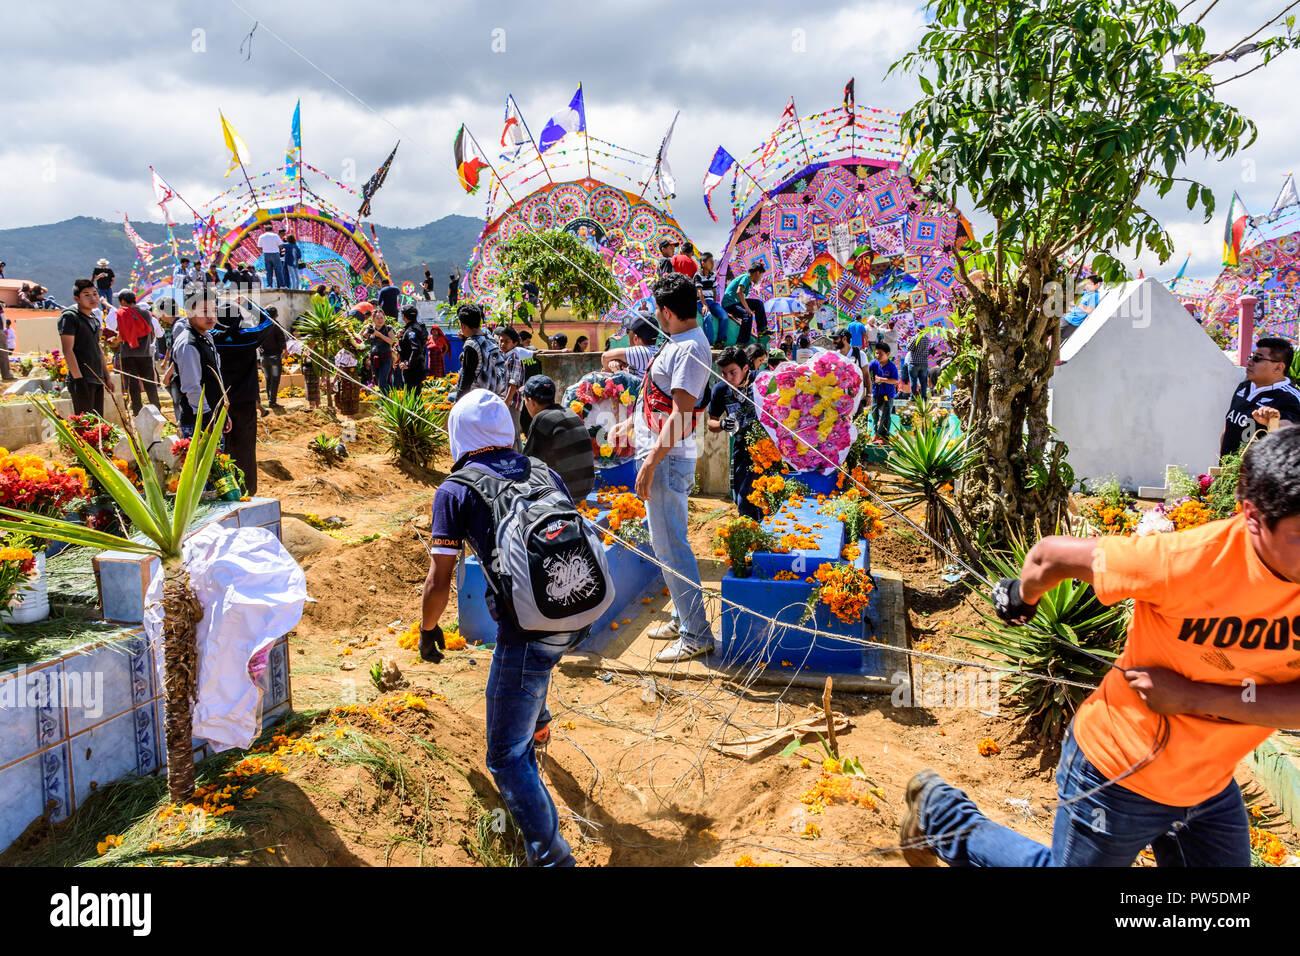 Santiago Sacatepequez, Guatemala - November 1, 2017: Flying kites during Giant kite festival honoring spirits of dead in cemetery on All Saints Day. - Stock Image